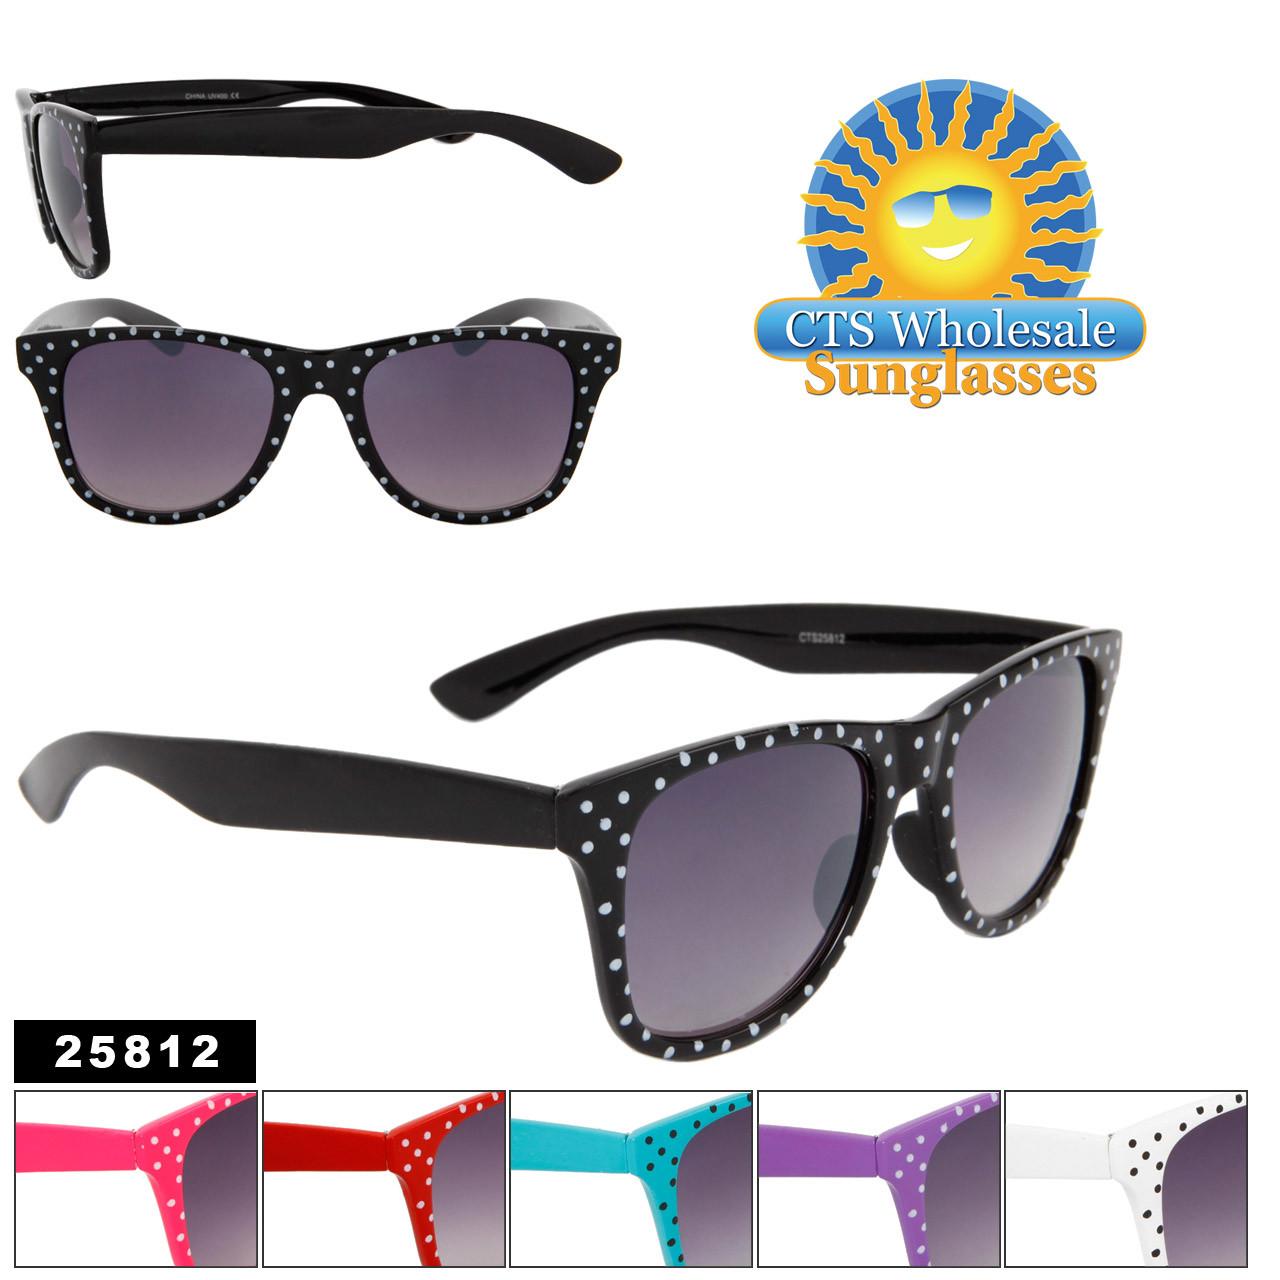 New Polka Dot Wayfarer Sunglasses! Item 25812